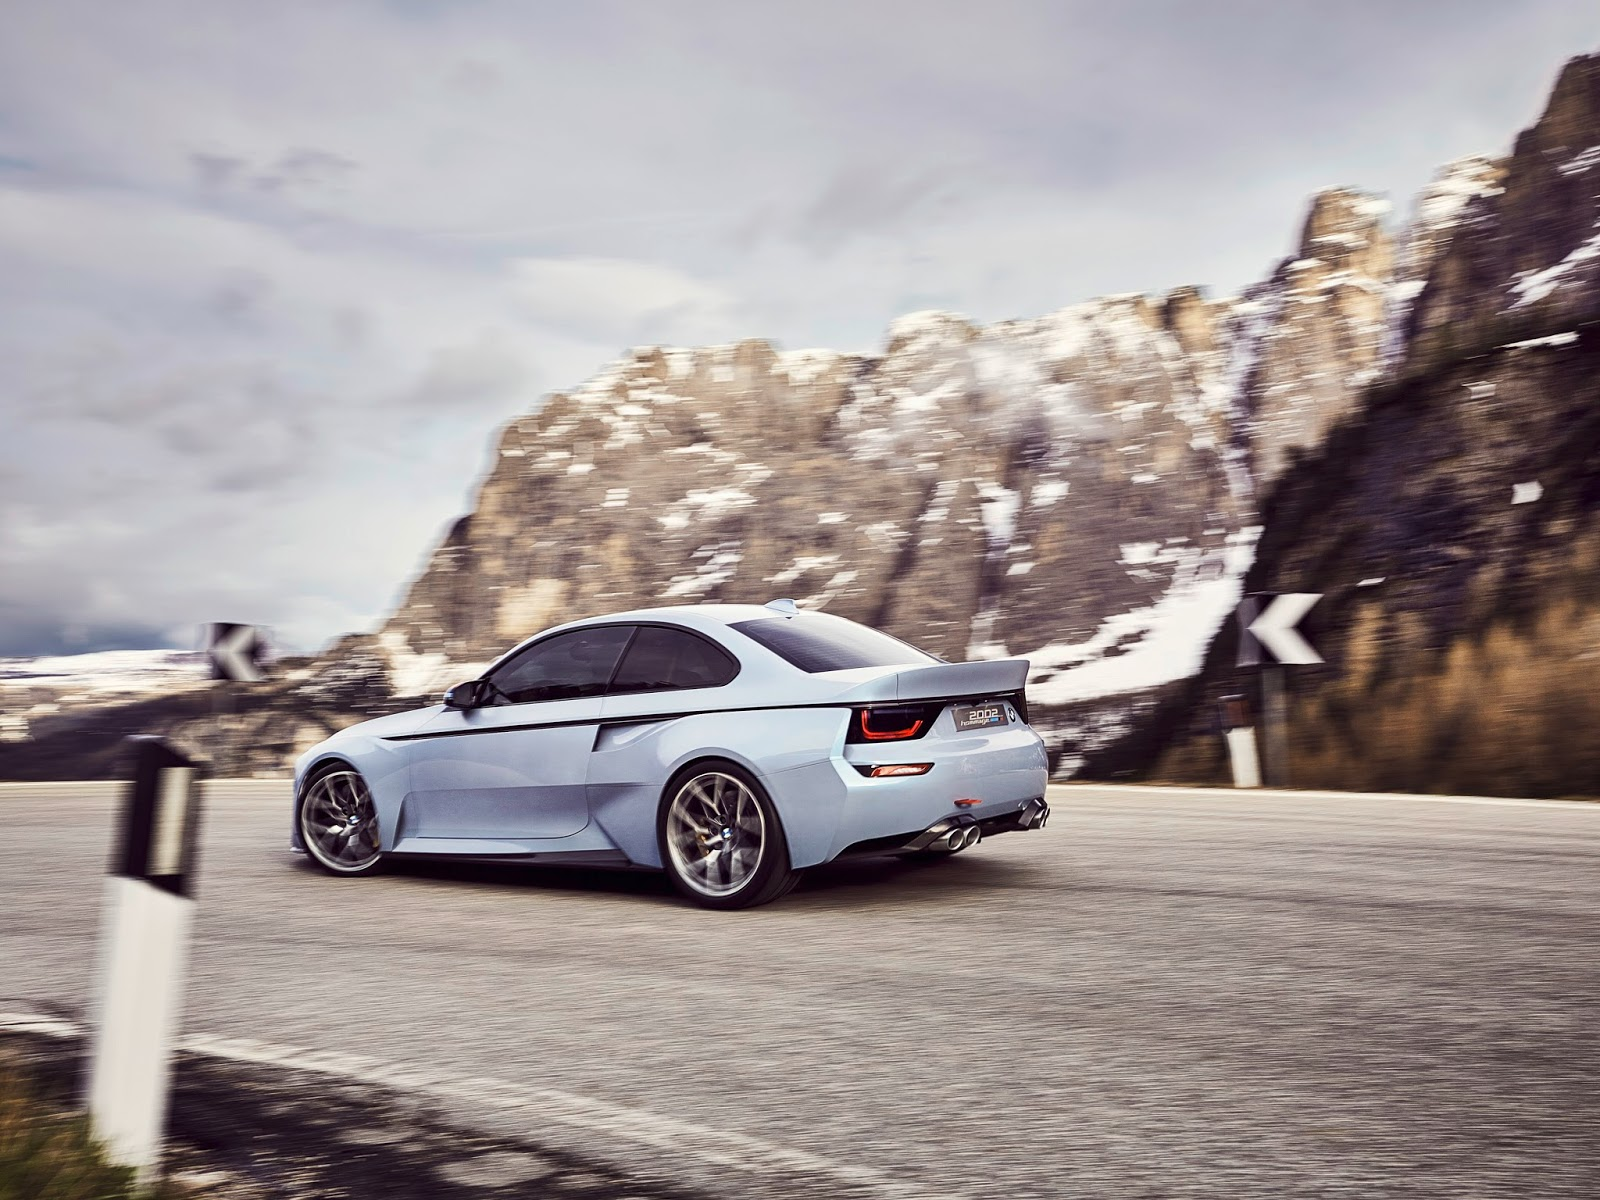 P90219722 highRes bmw 2002 hommage 05 1 1 H BMW γιορτάζει τα 50 χρόνια της θρυλικής 2002 turbo και παρουσιάζει την Bmw 2002 Hommage BMW, BMW 2002, BMW 2002 turbo, BMW Concept, BMW Hommage, supercars, videos